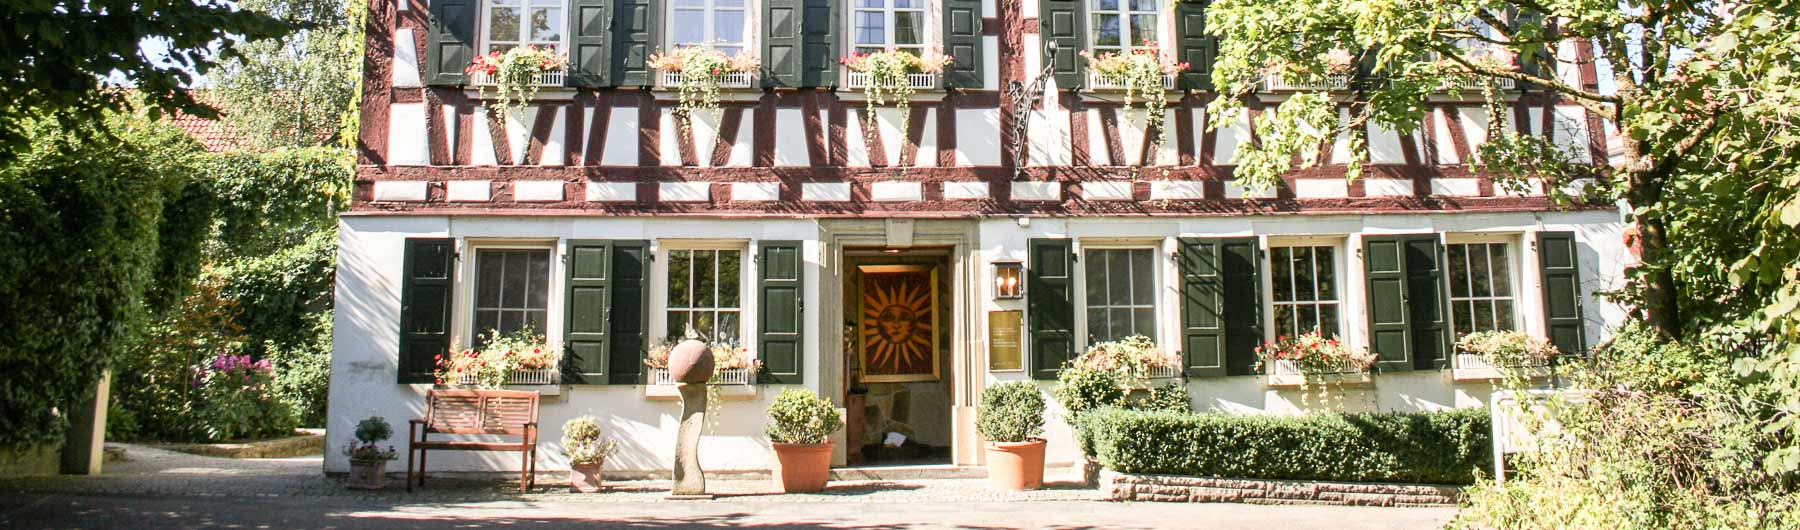 Der SoulSpice-Sonnenhof in Hohenlohe